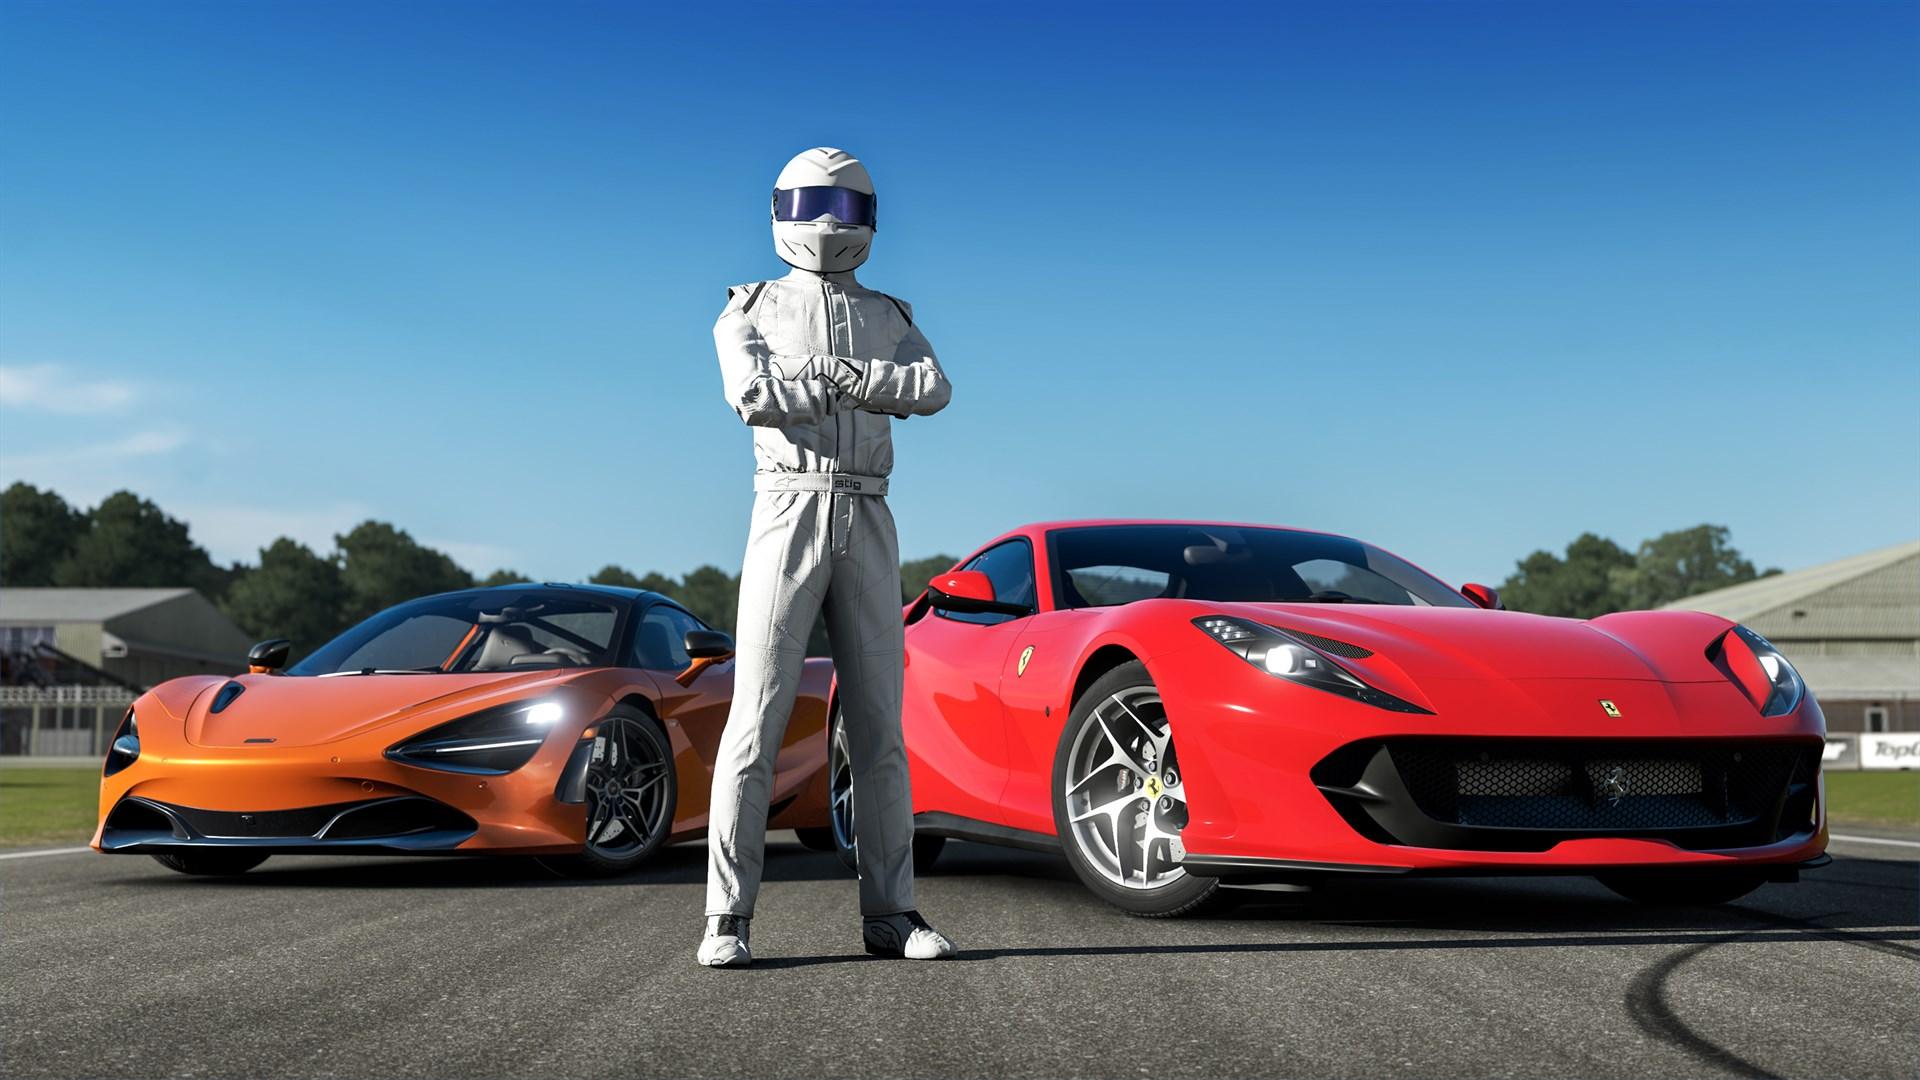 Top Gear Forza Motorsport 7 Car Pack